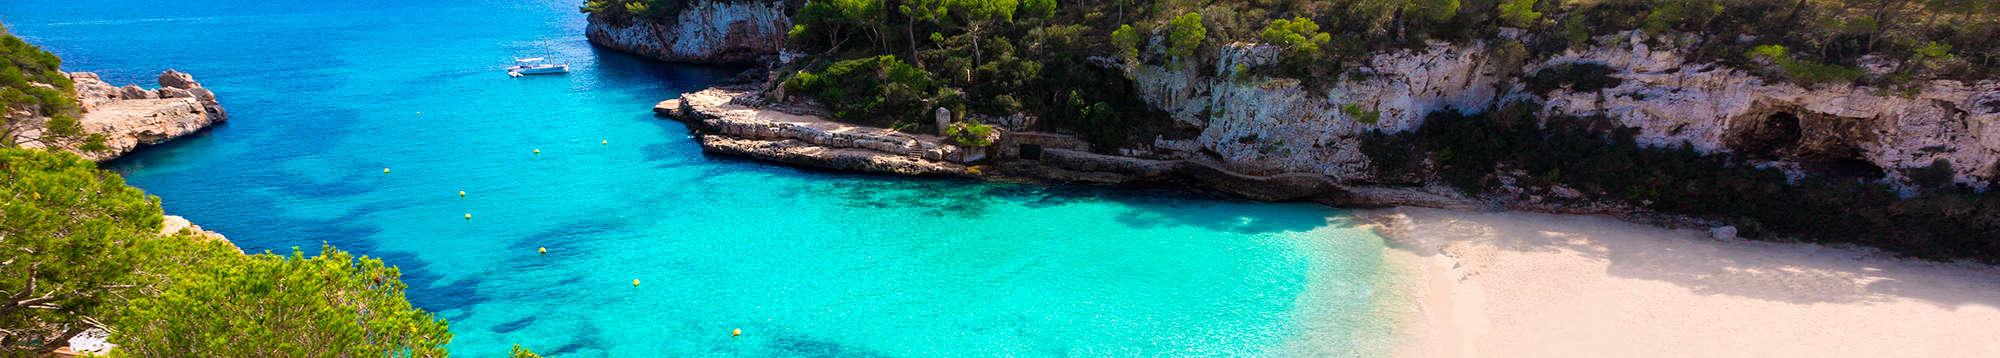 Escapadas fin de semana en Islas